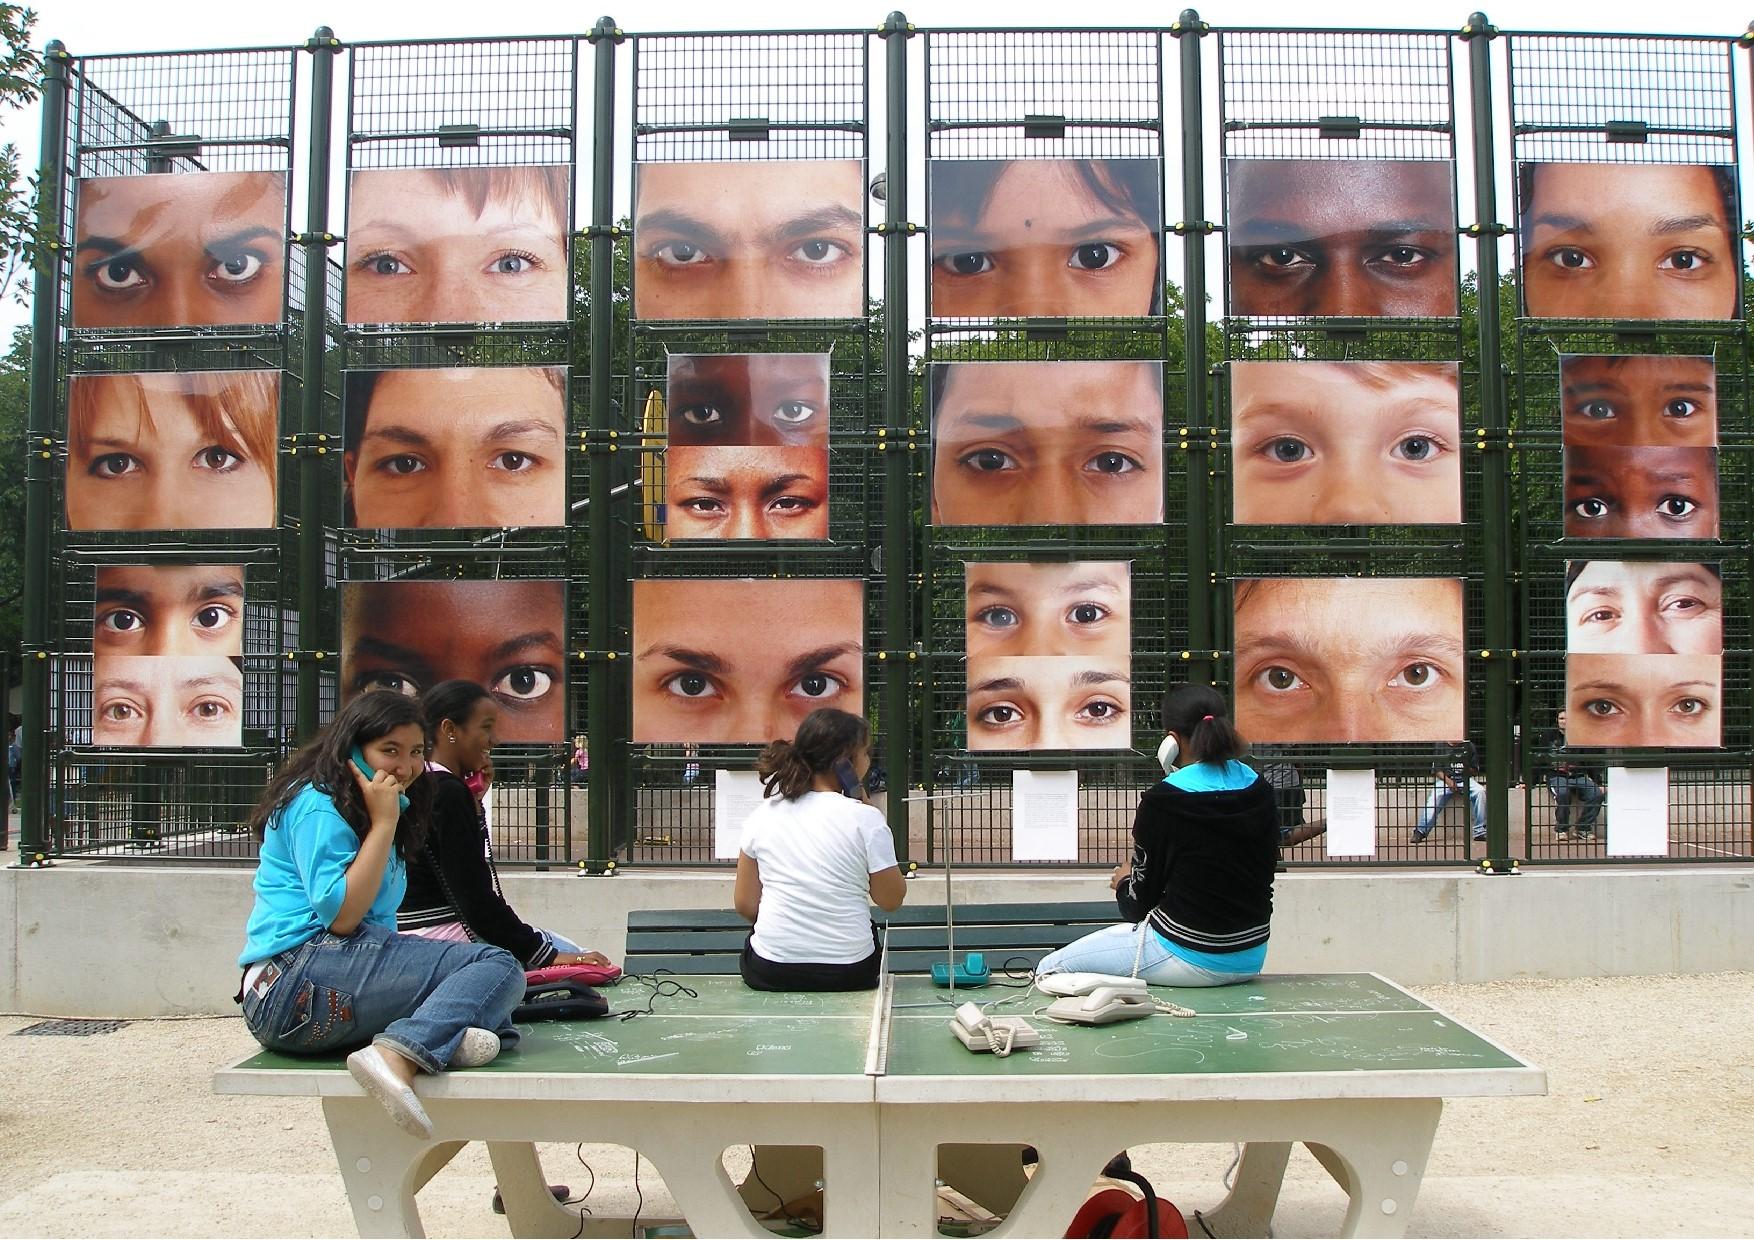 Mur portraits.jpg